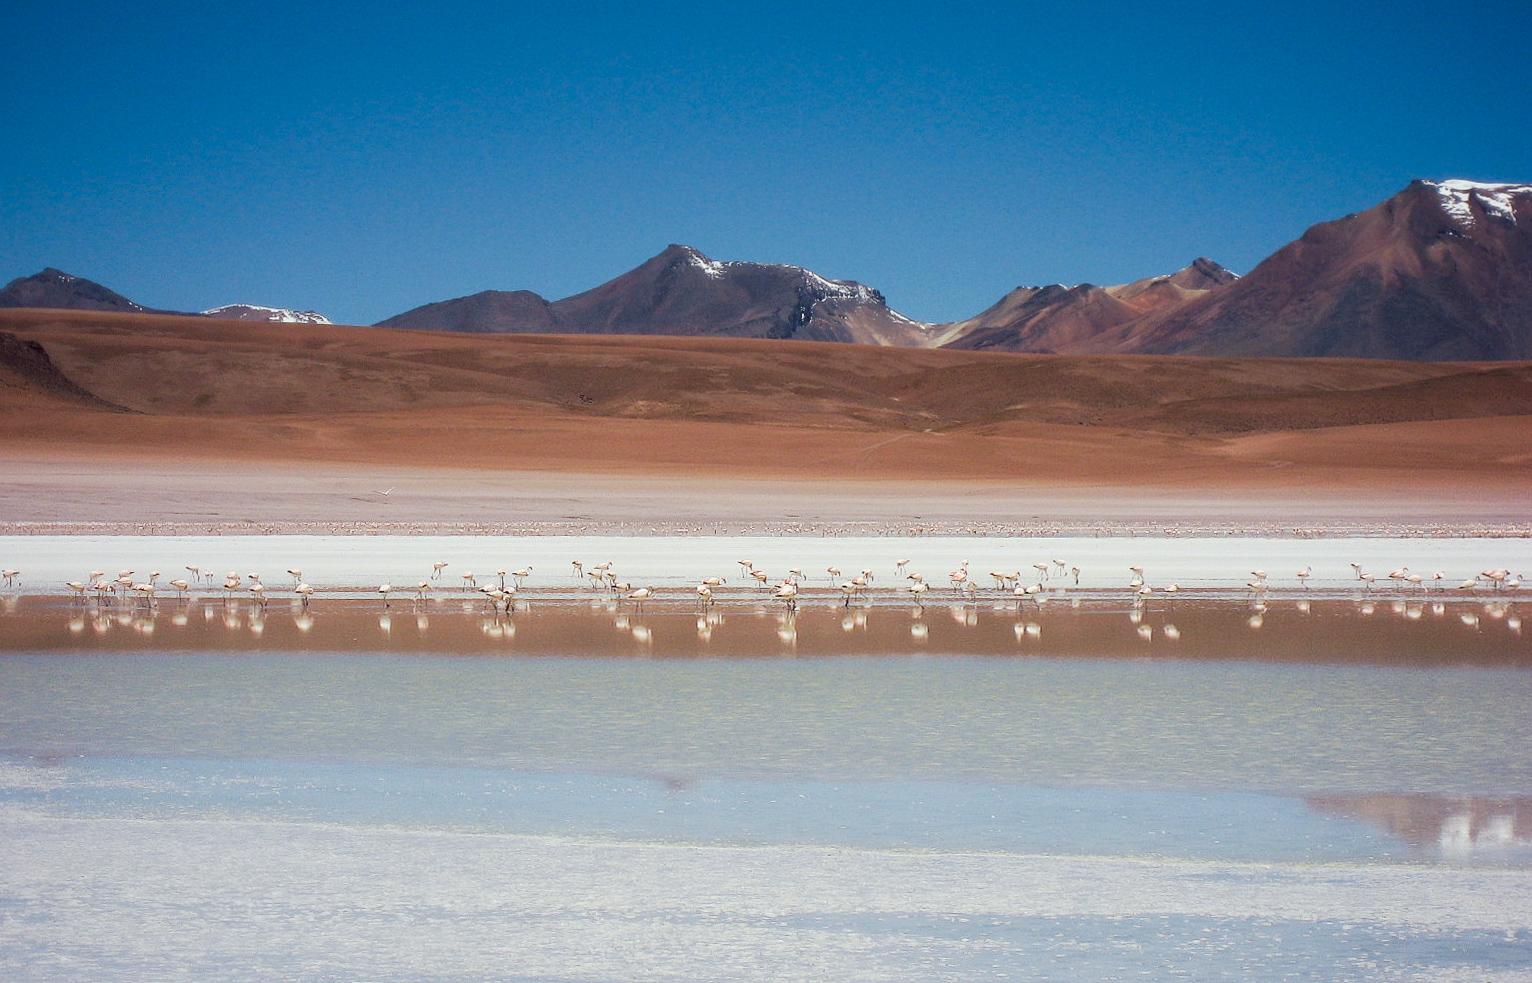 uyuni_salt-flats_day2-8857-flamingos-in-distance.jpg